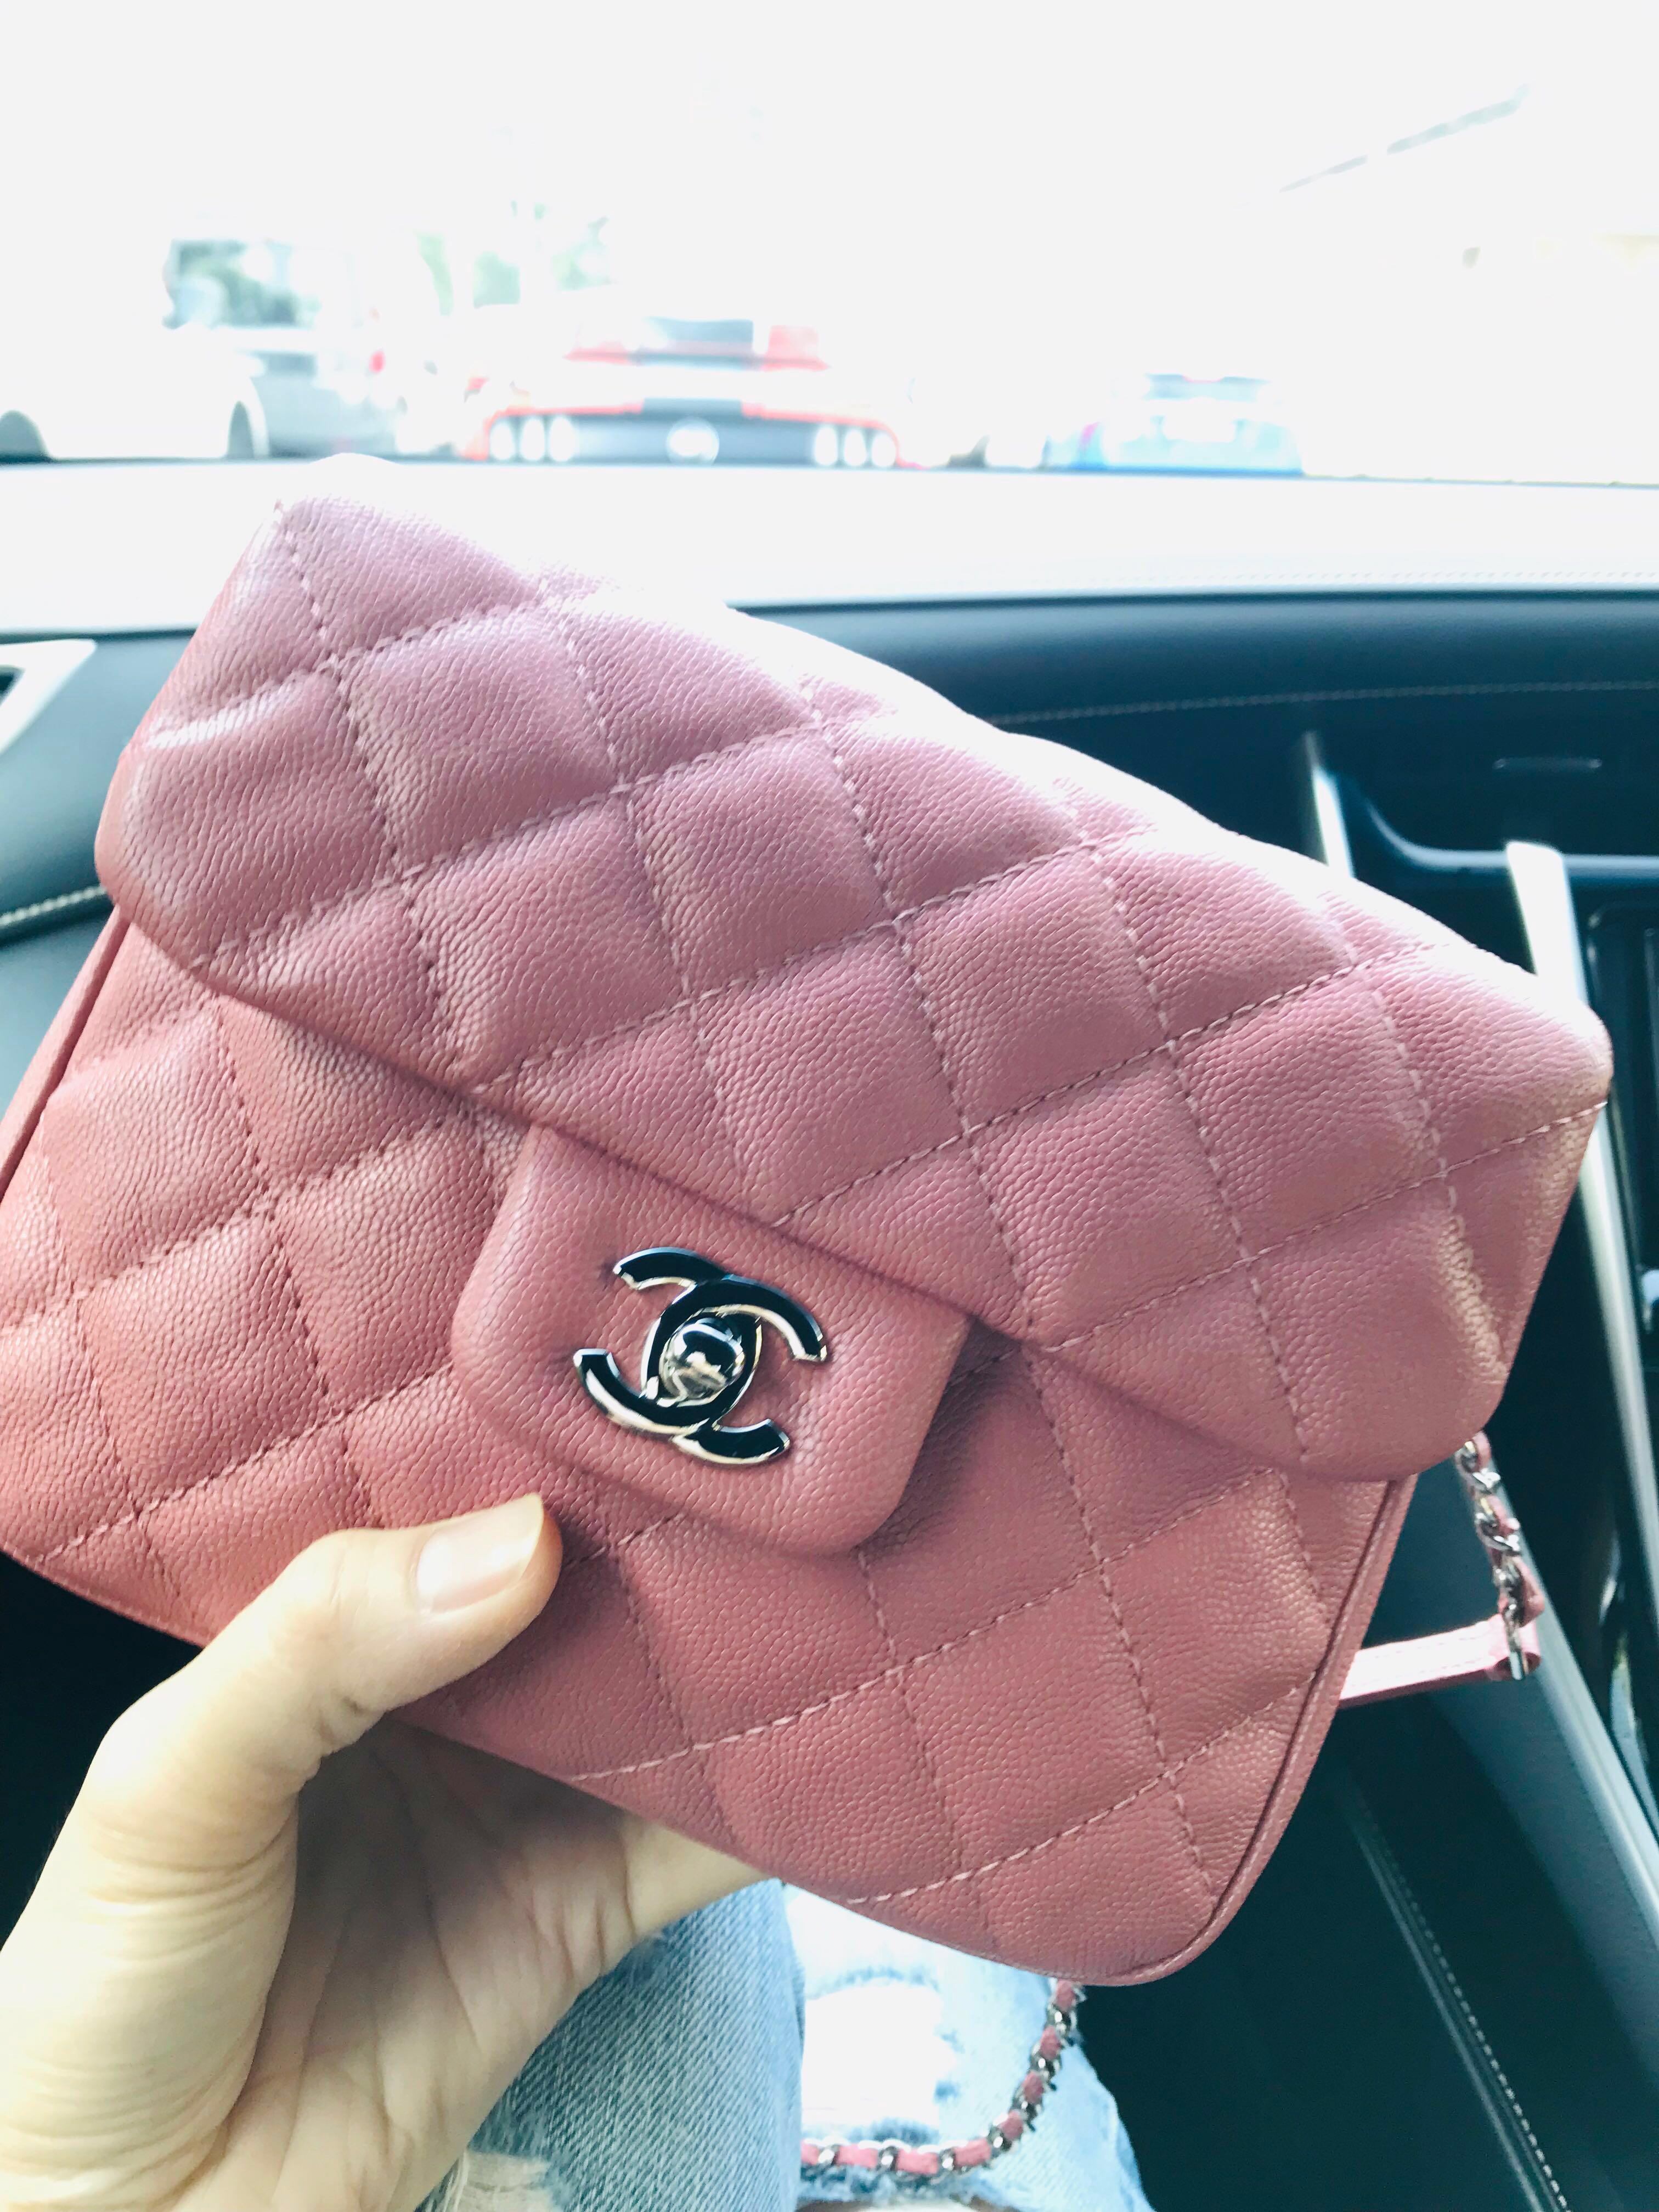 23149f496f66 Chanel Urban Companion Small Caviar Pink, Women's Fashion, Bags & Wallets,  Handbags on Carousell